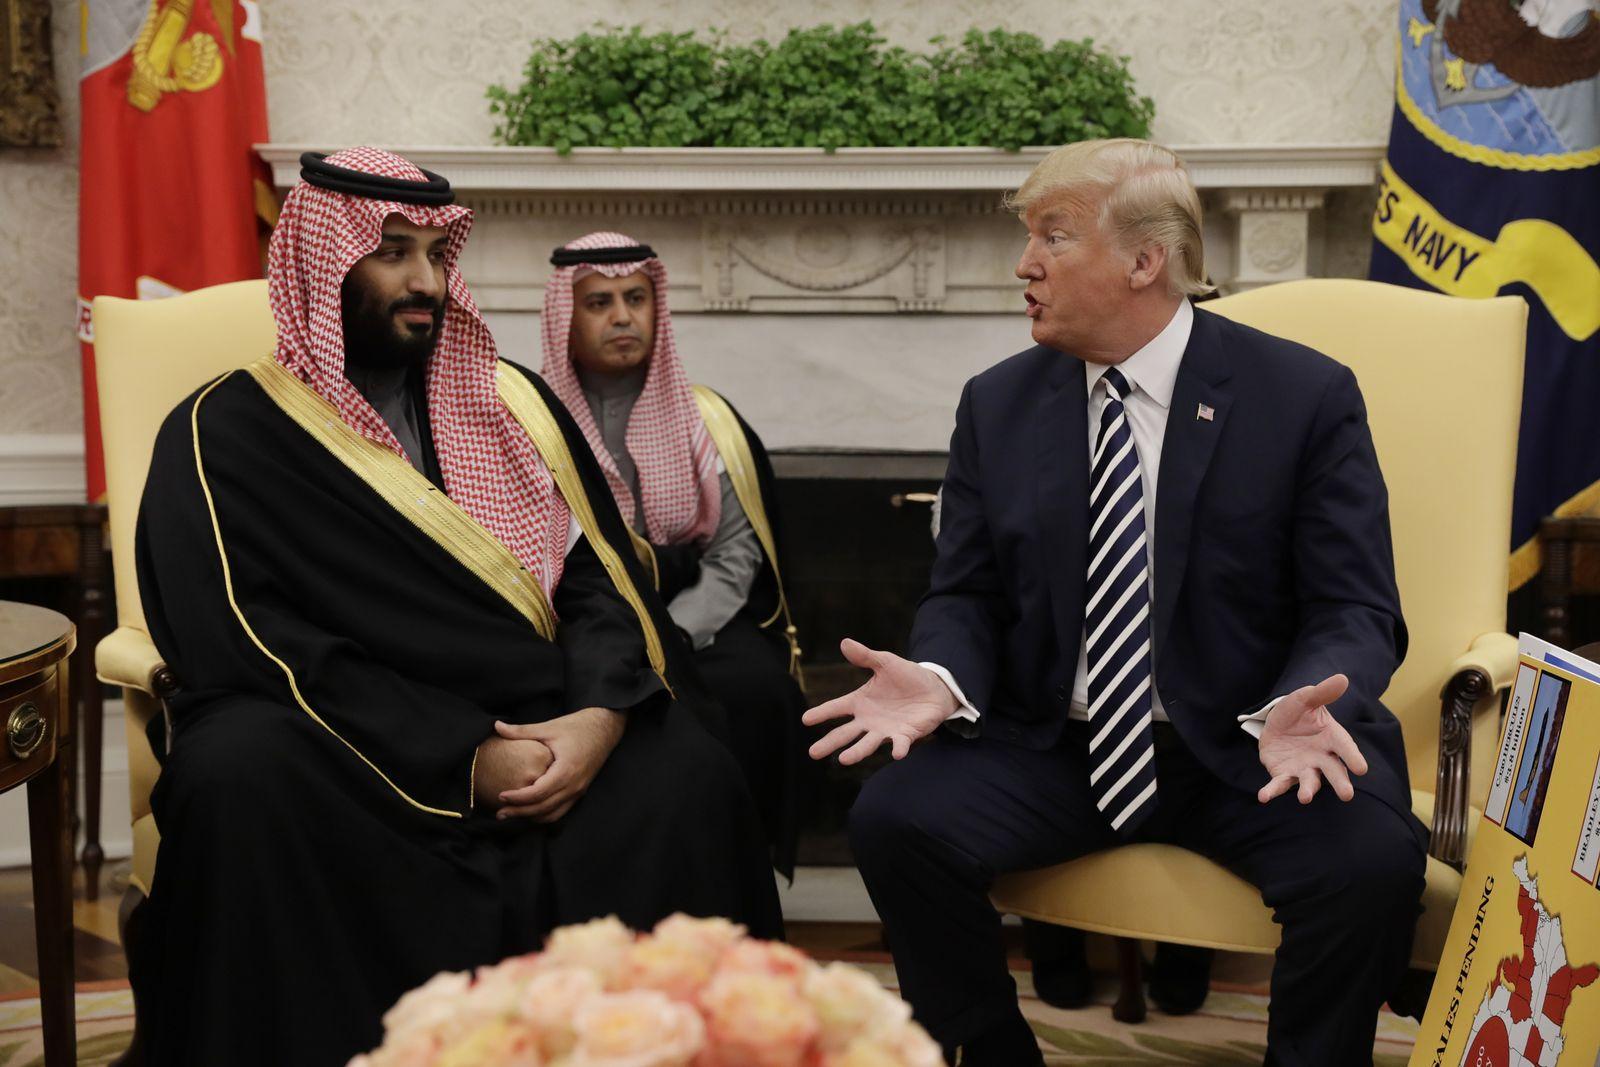 Mohammed bin Salman/ DonaldTrump